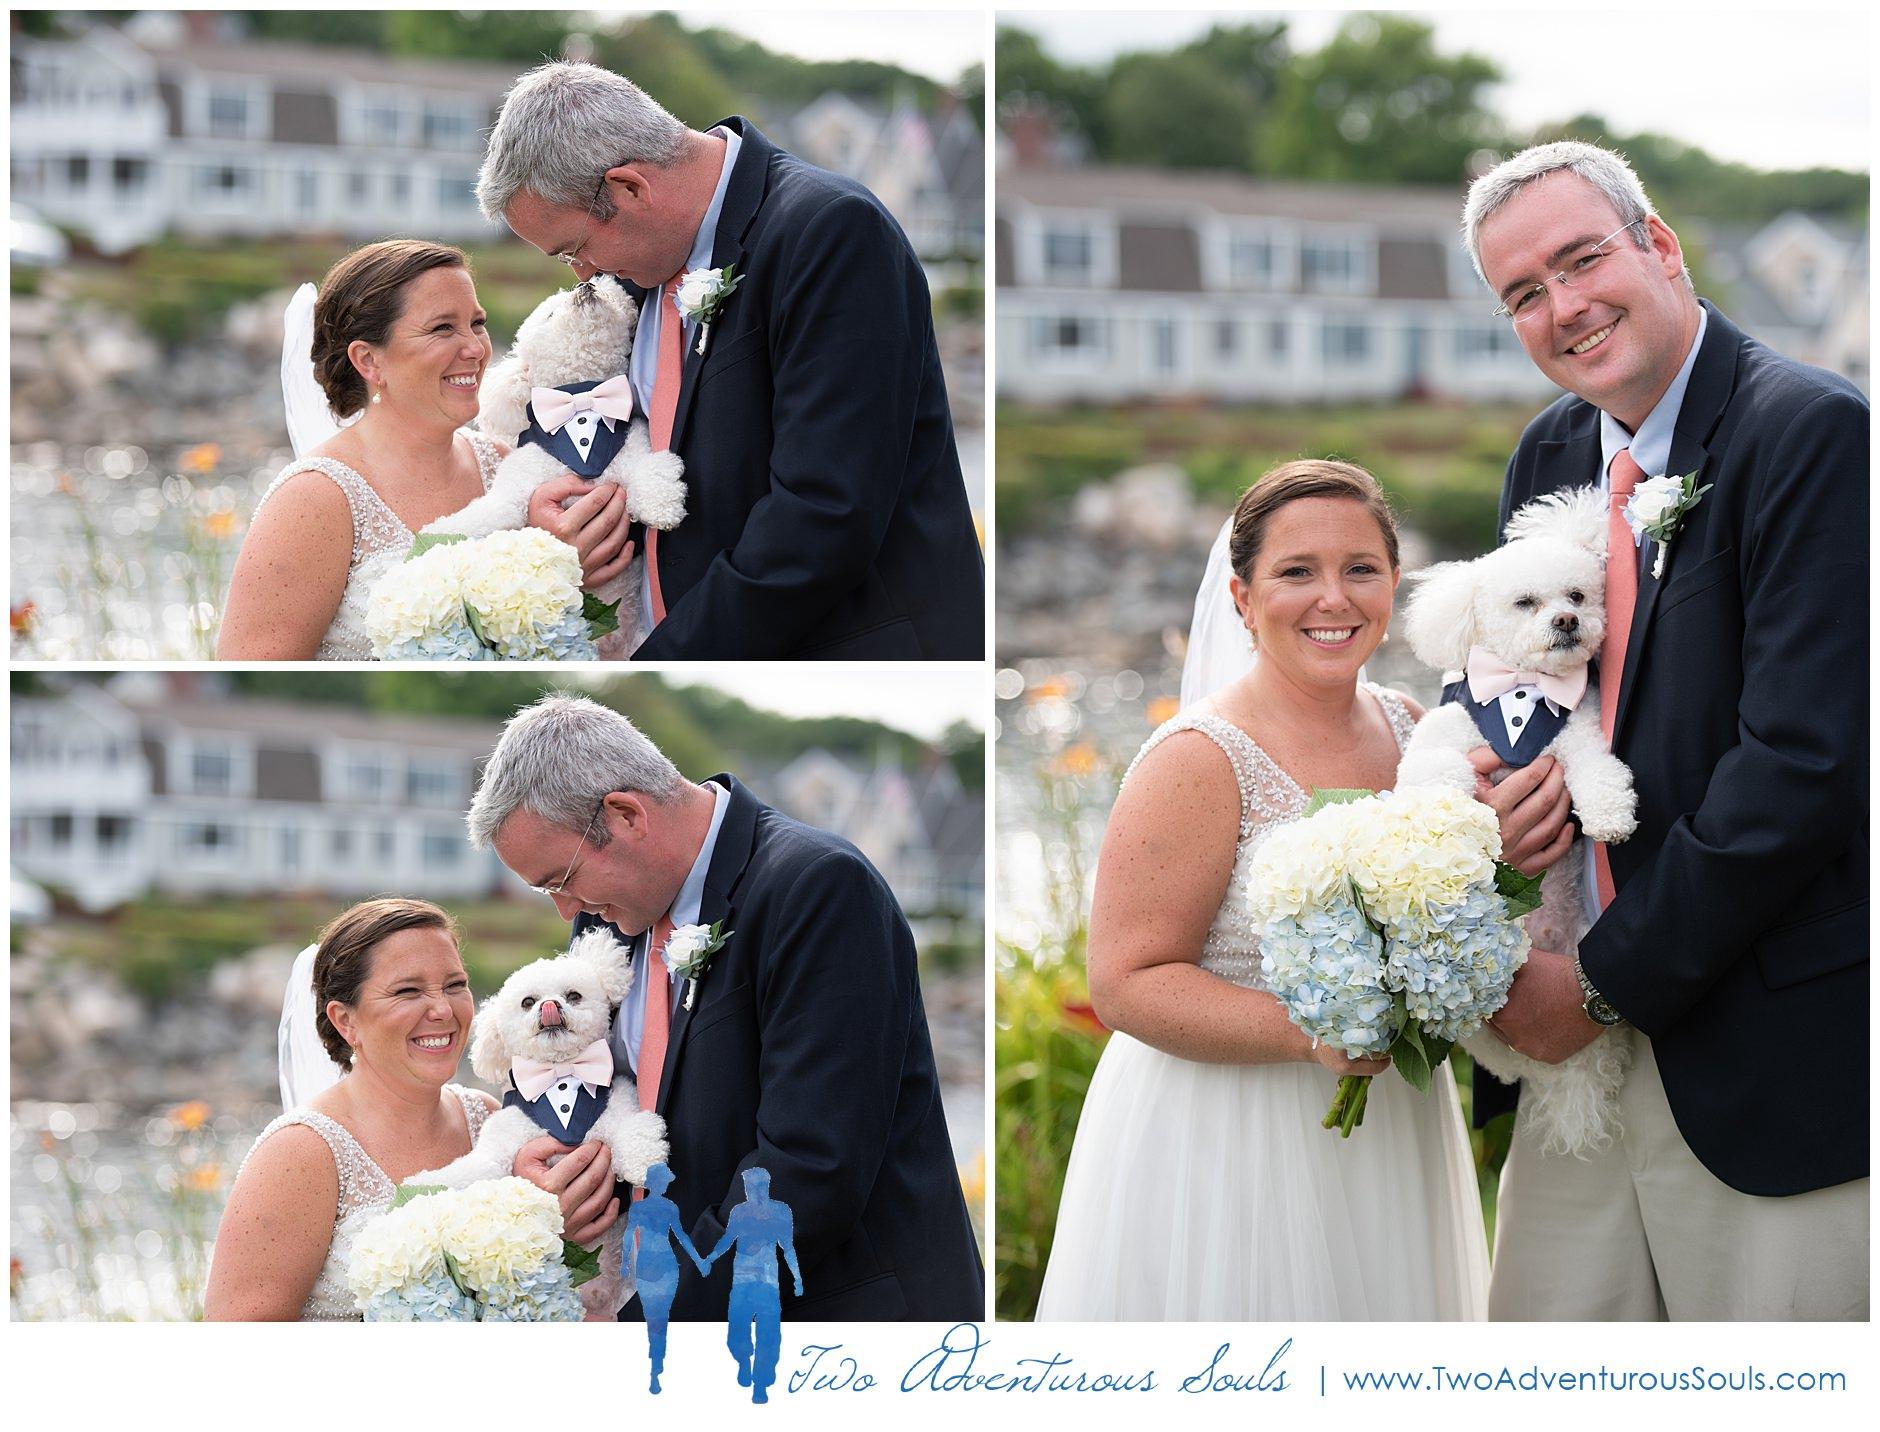 Maine Wedding Photographers, Ogunquit Wedding Photographers, Maine Elopement Photographers, Two Adventurous Souls-080619_0020.jpg